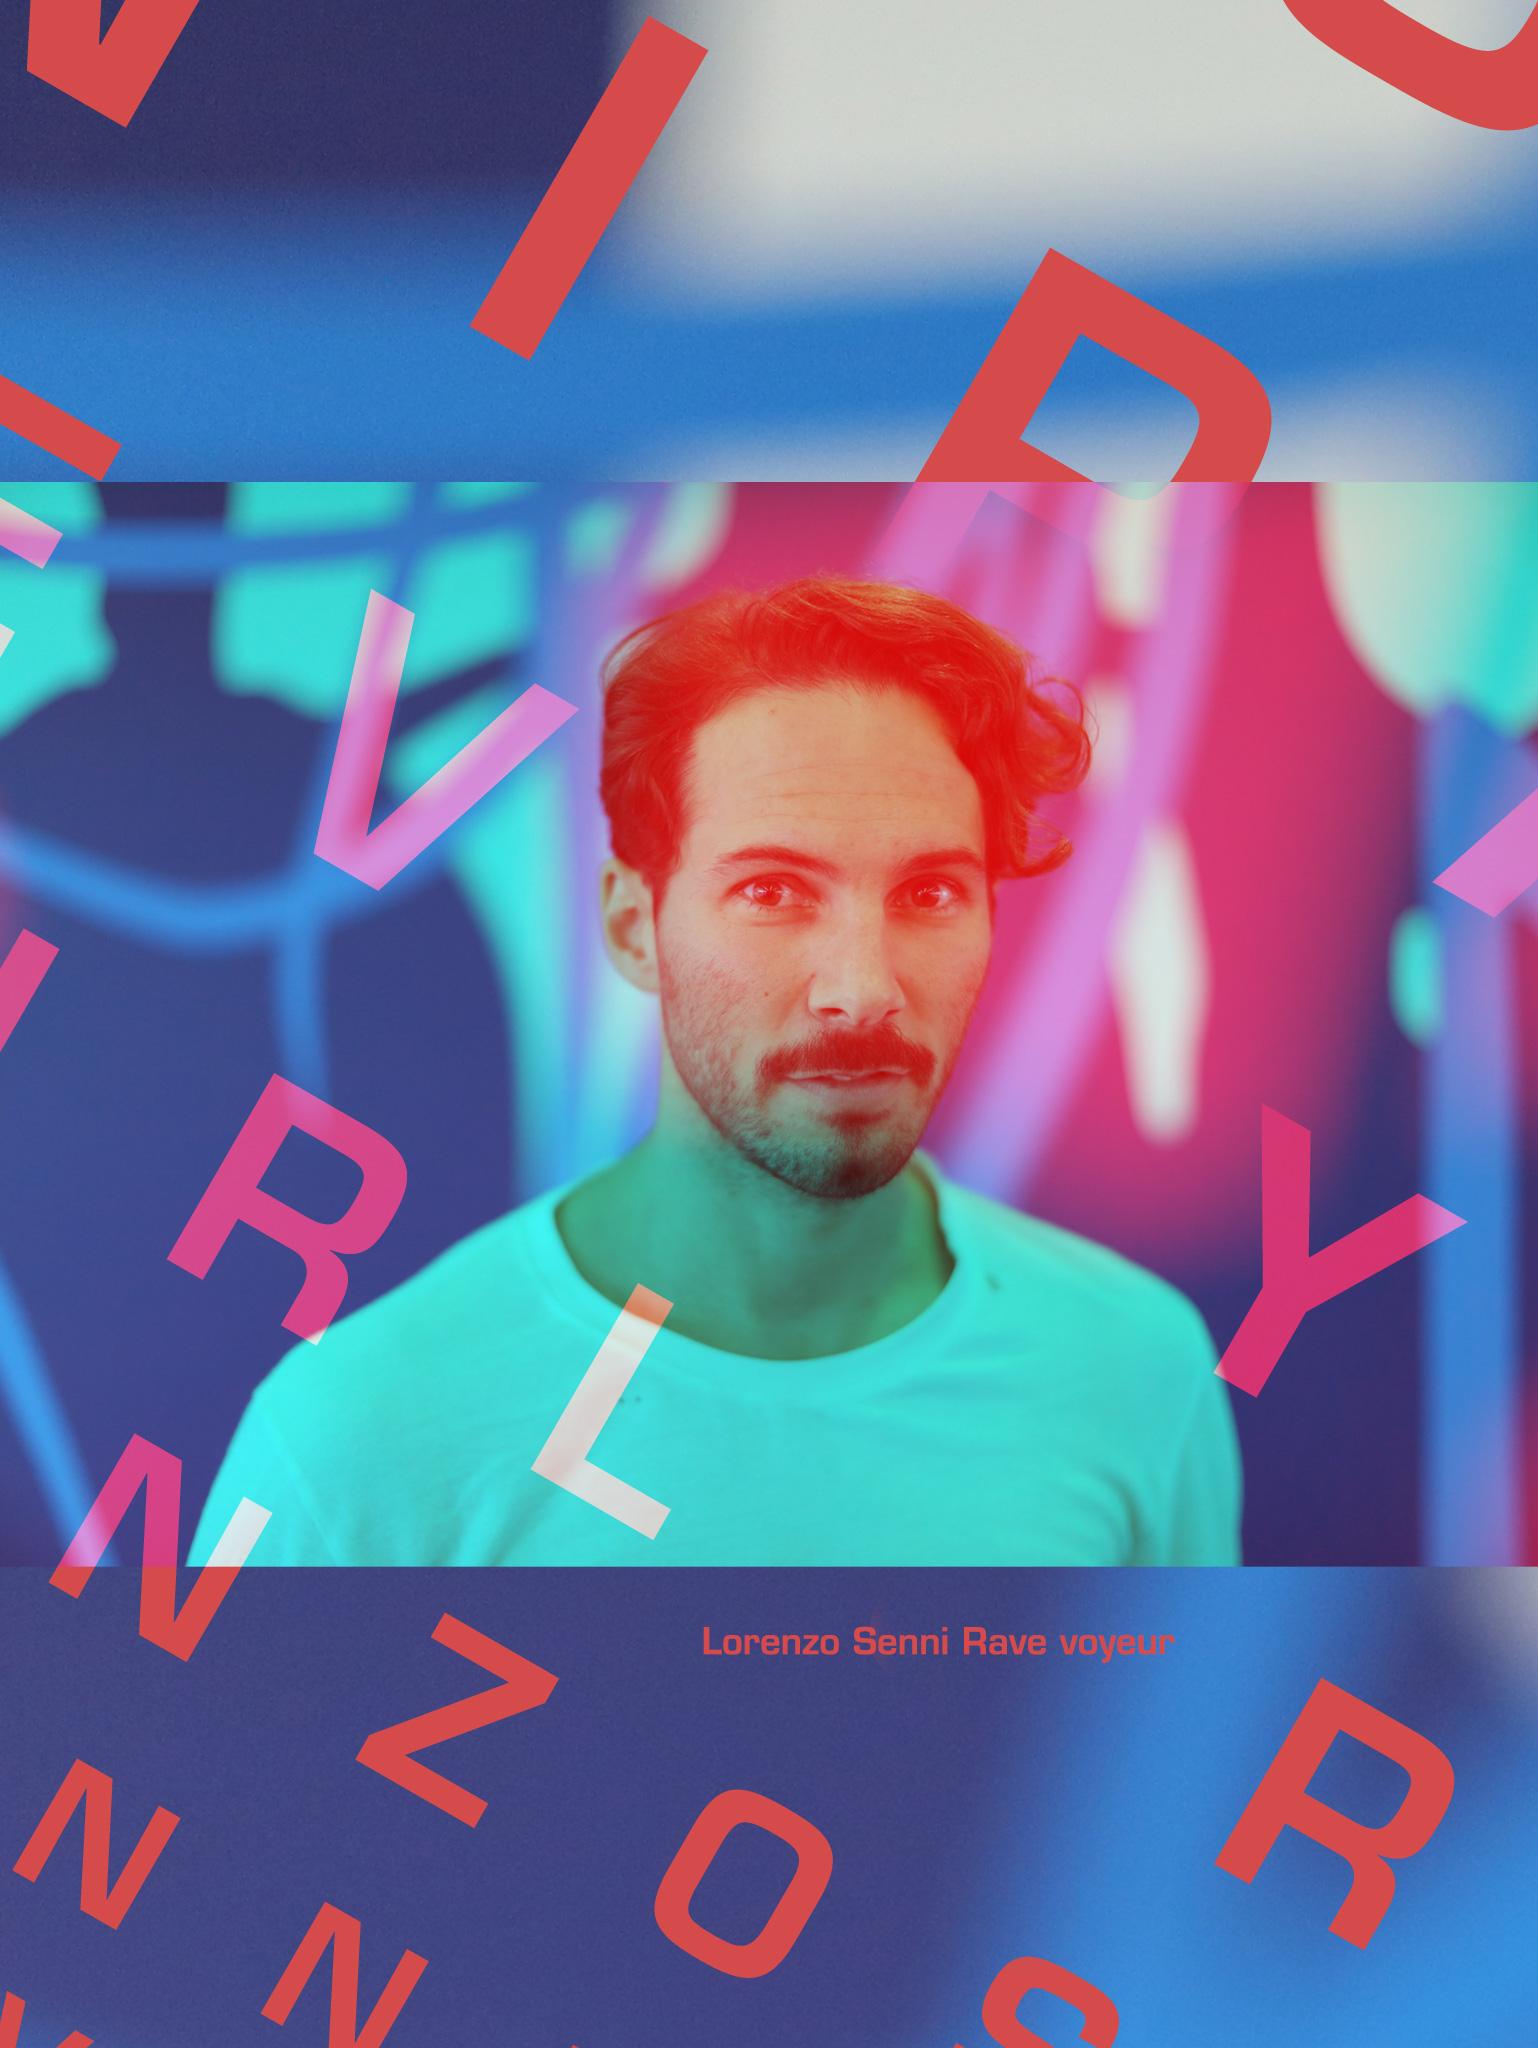 Lorenzo Senni: Rave voyeur